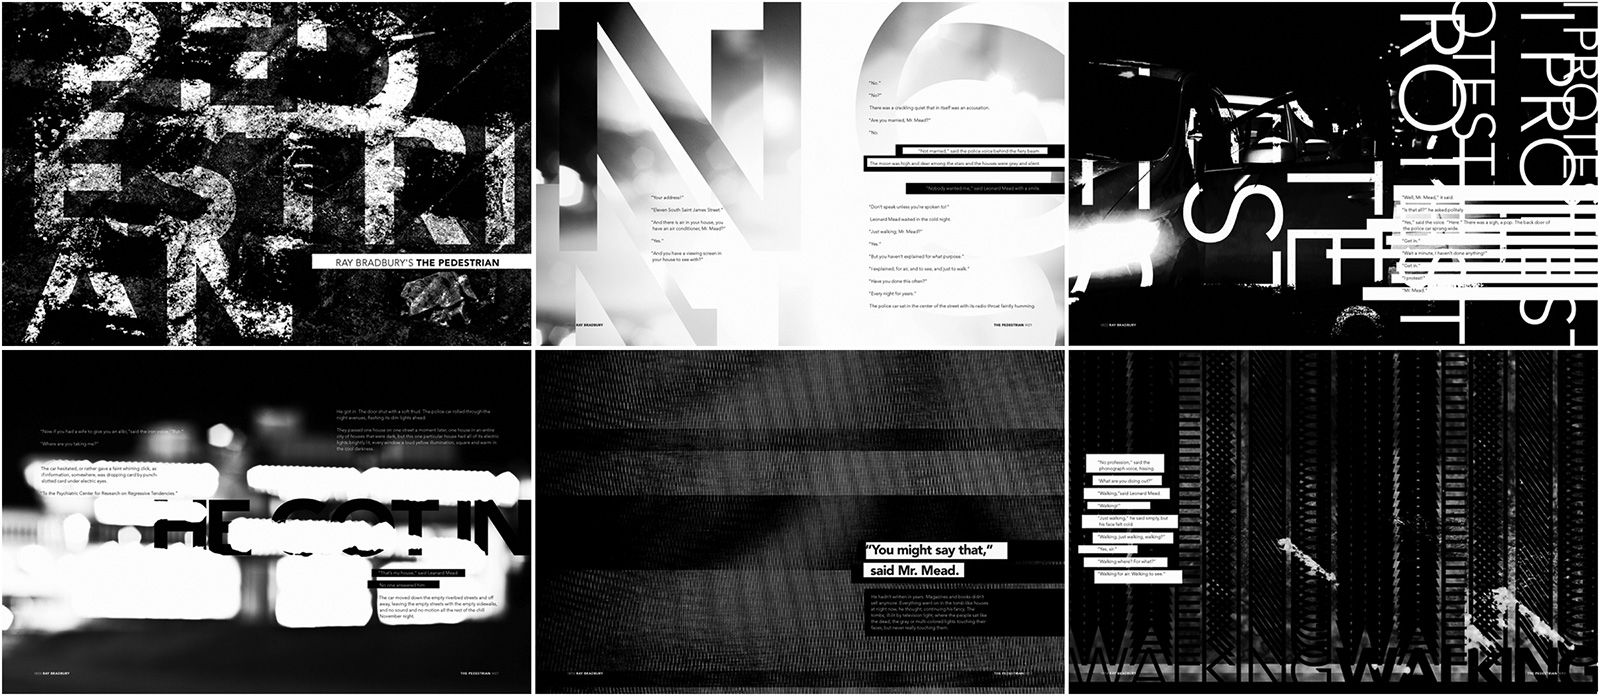 Bethany Brasil, Graphic Design 3, 2013, Umass Dartmouth